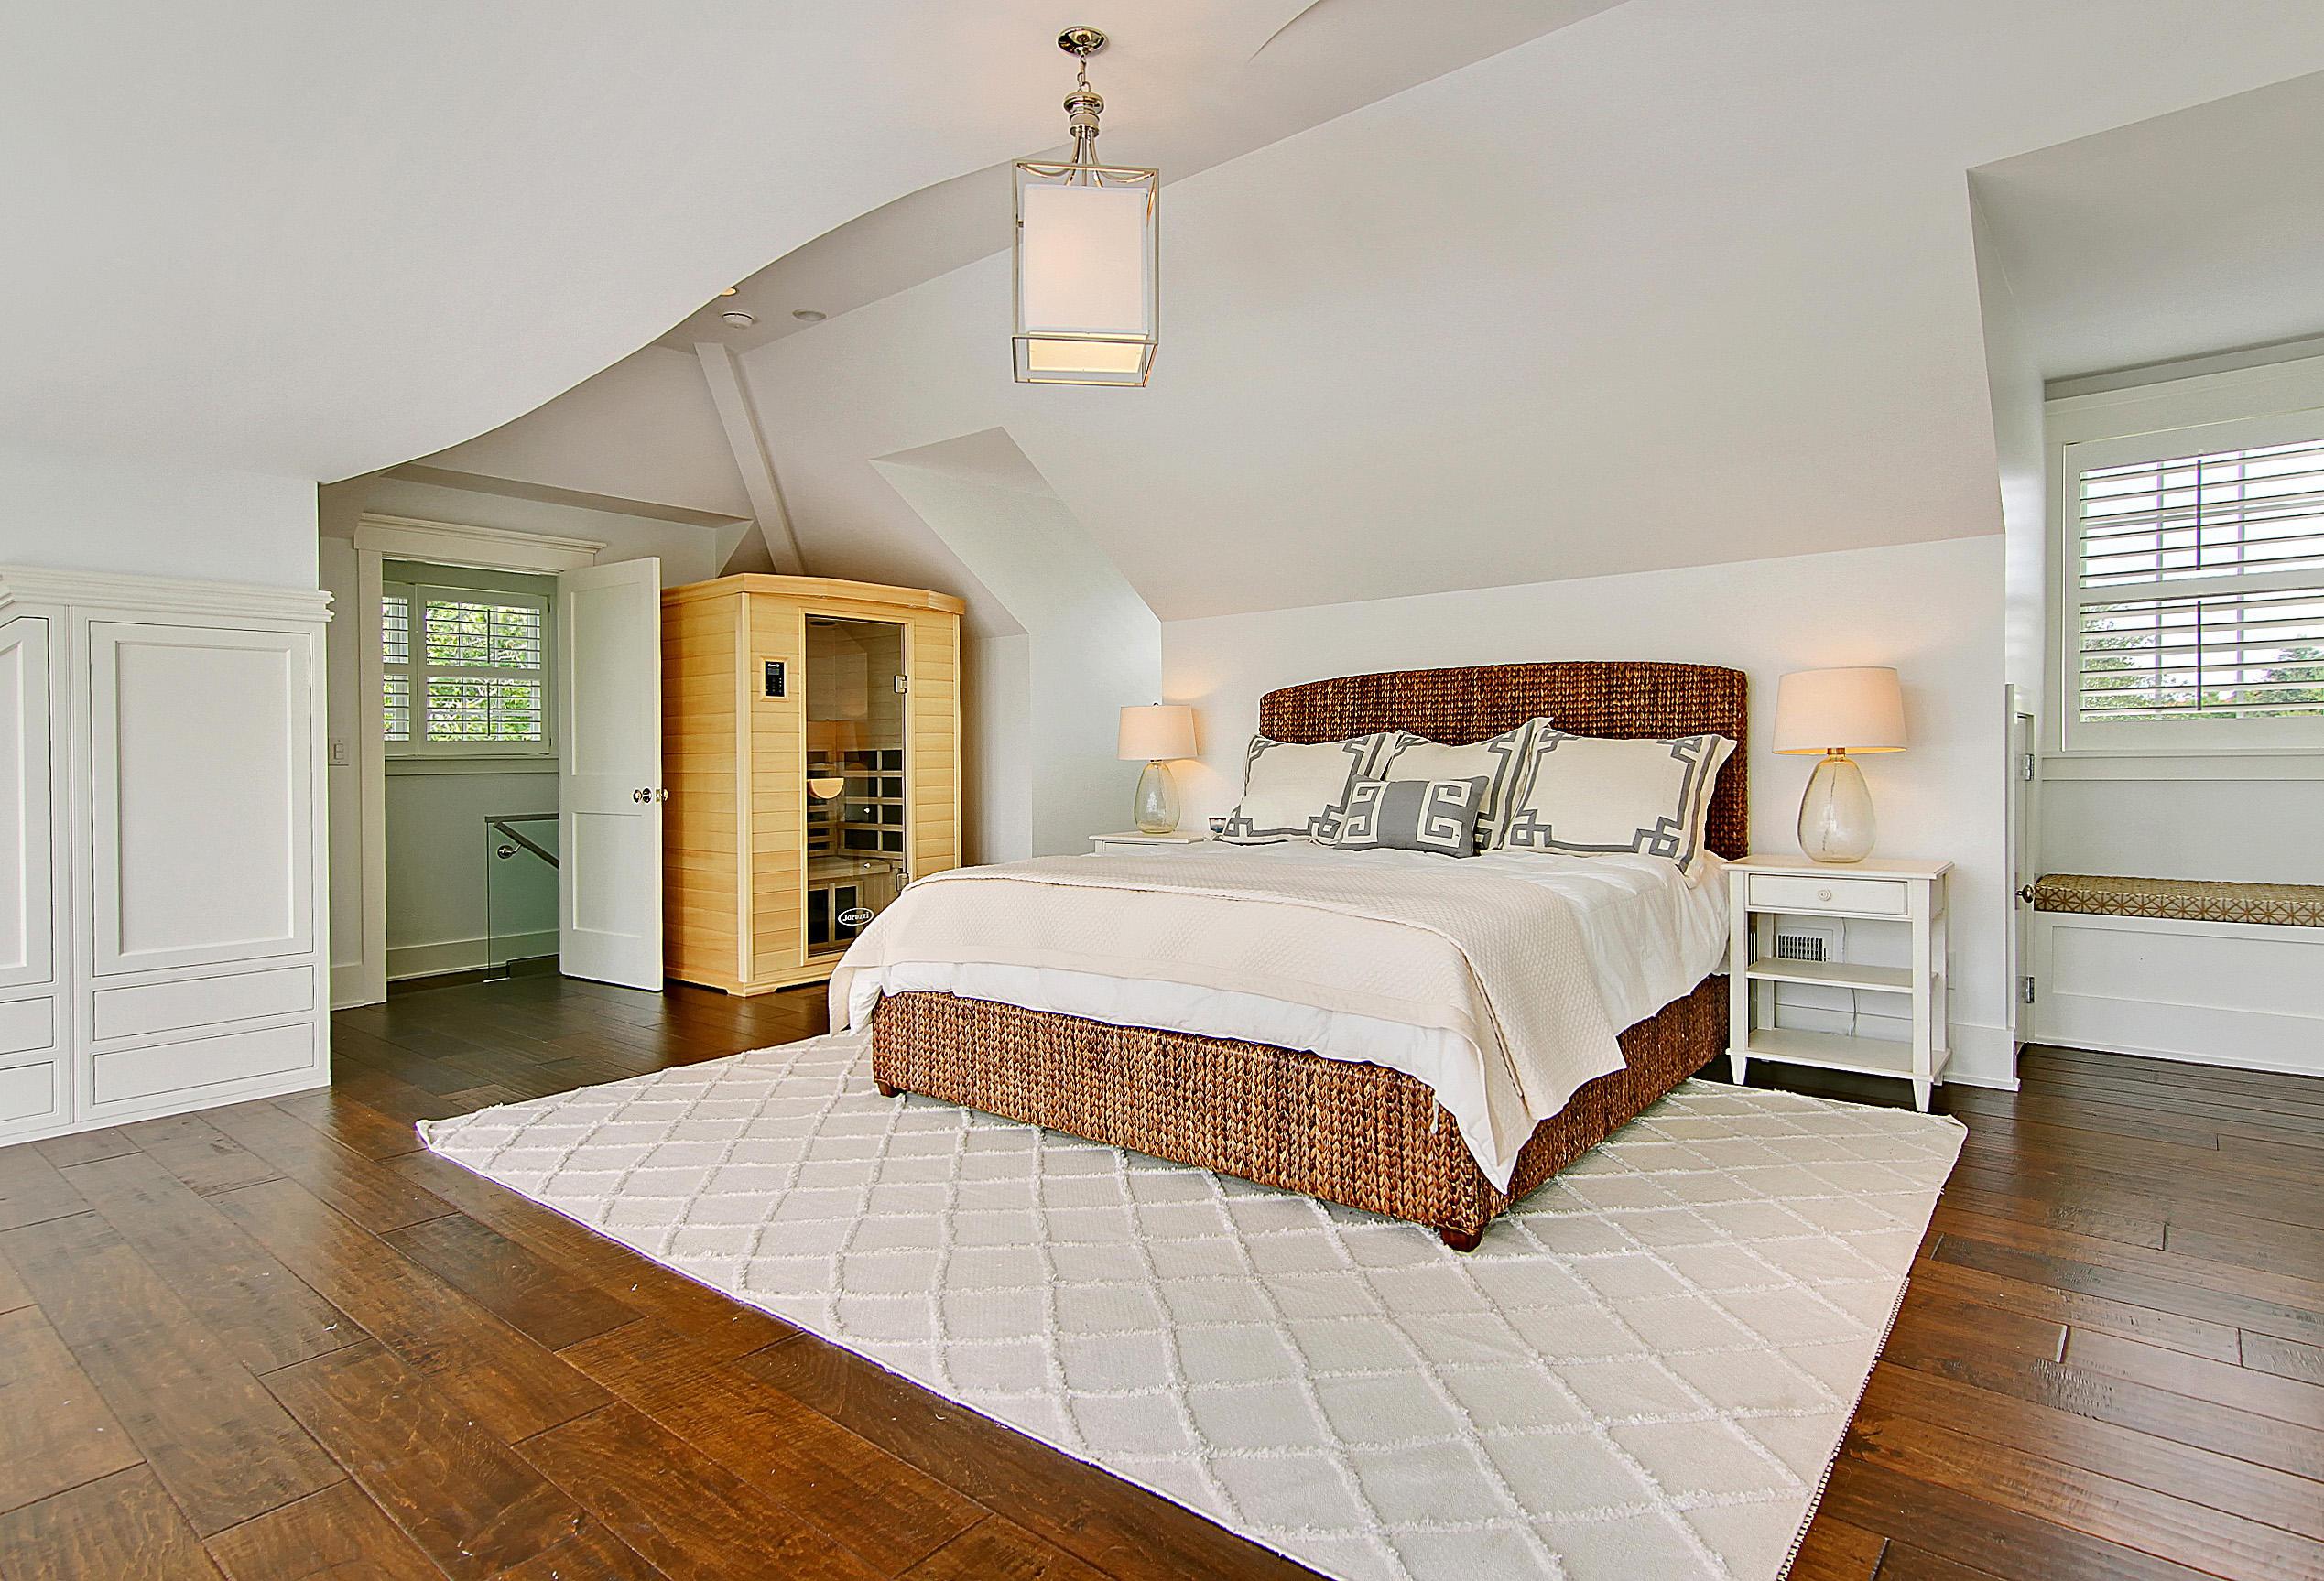 Daniel Island Homes For Sale - 79 Dalton, Charleston, SC - 68